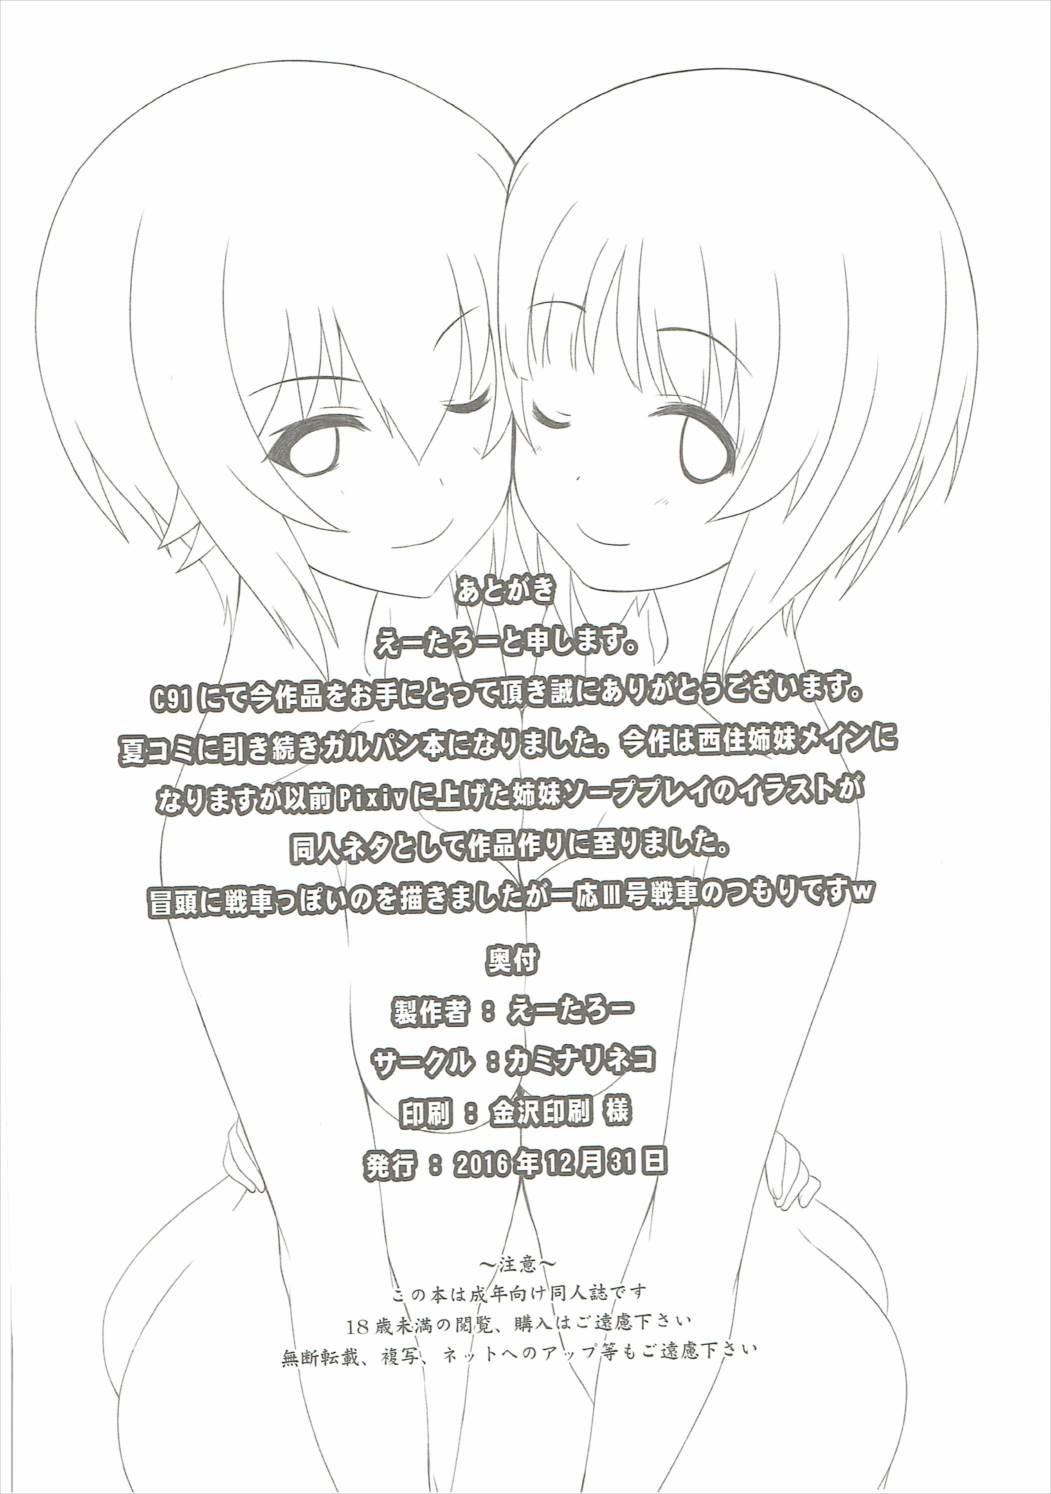 Nishizumi-ryuu Skinship 24